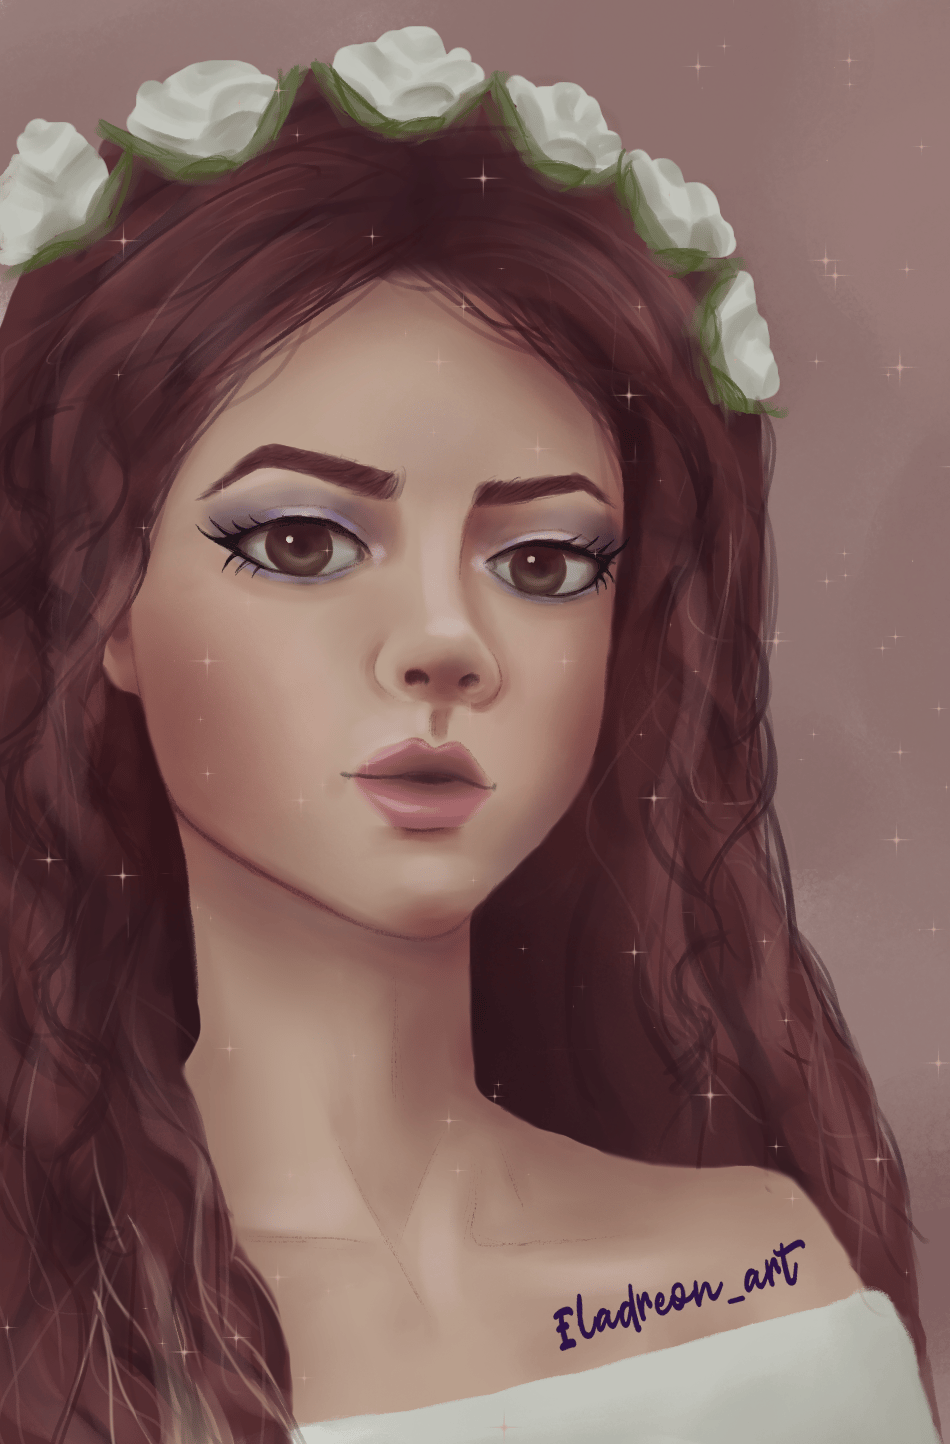 Girl portrait - image 1 - student project